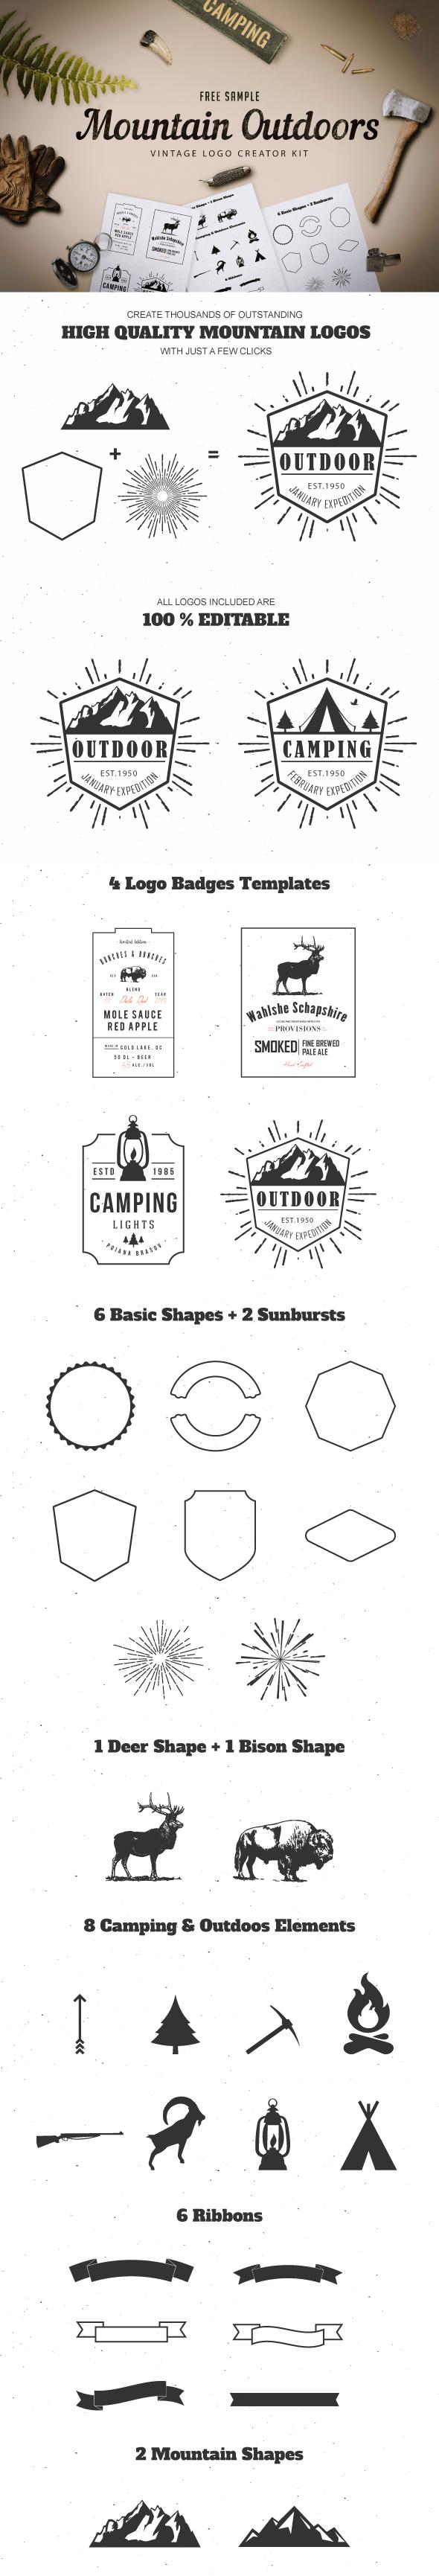 Free Sample Mountain Outdoor Vintage Logo Kit